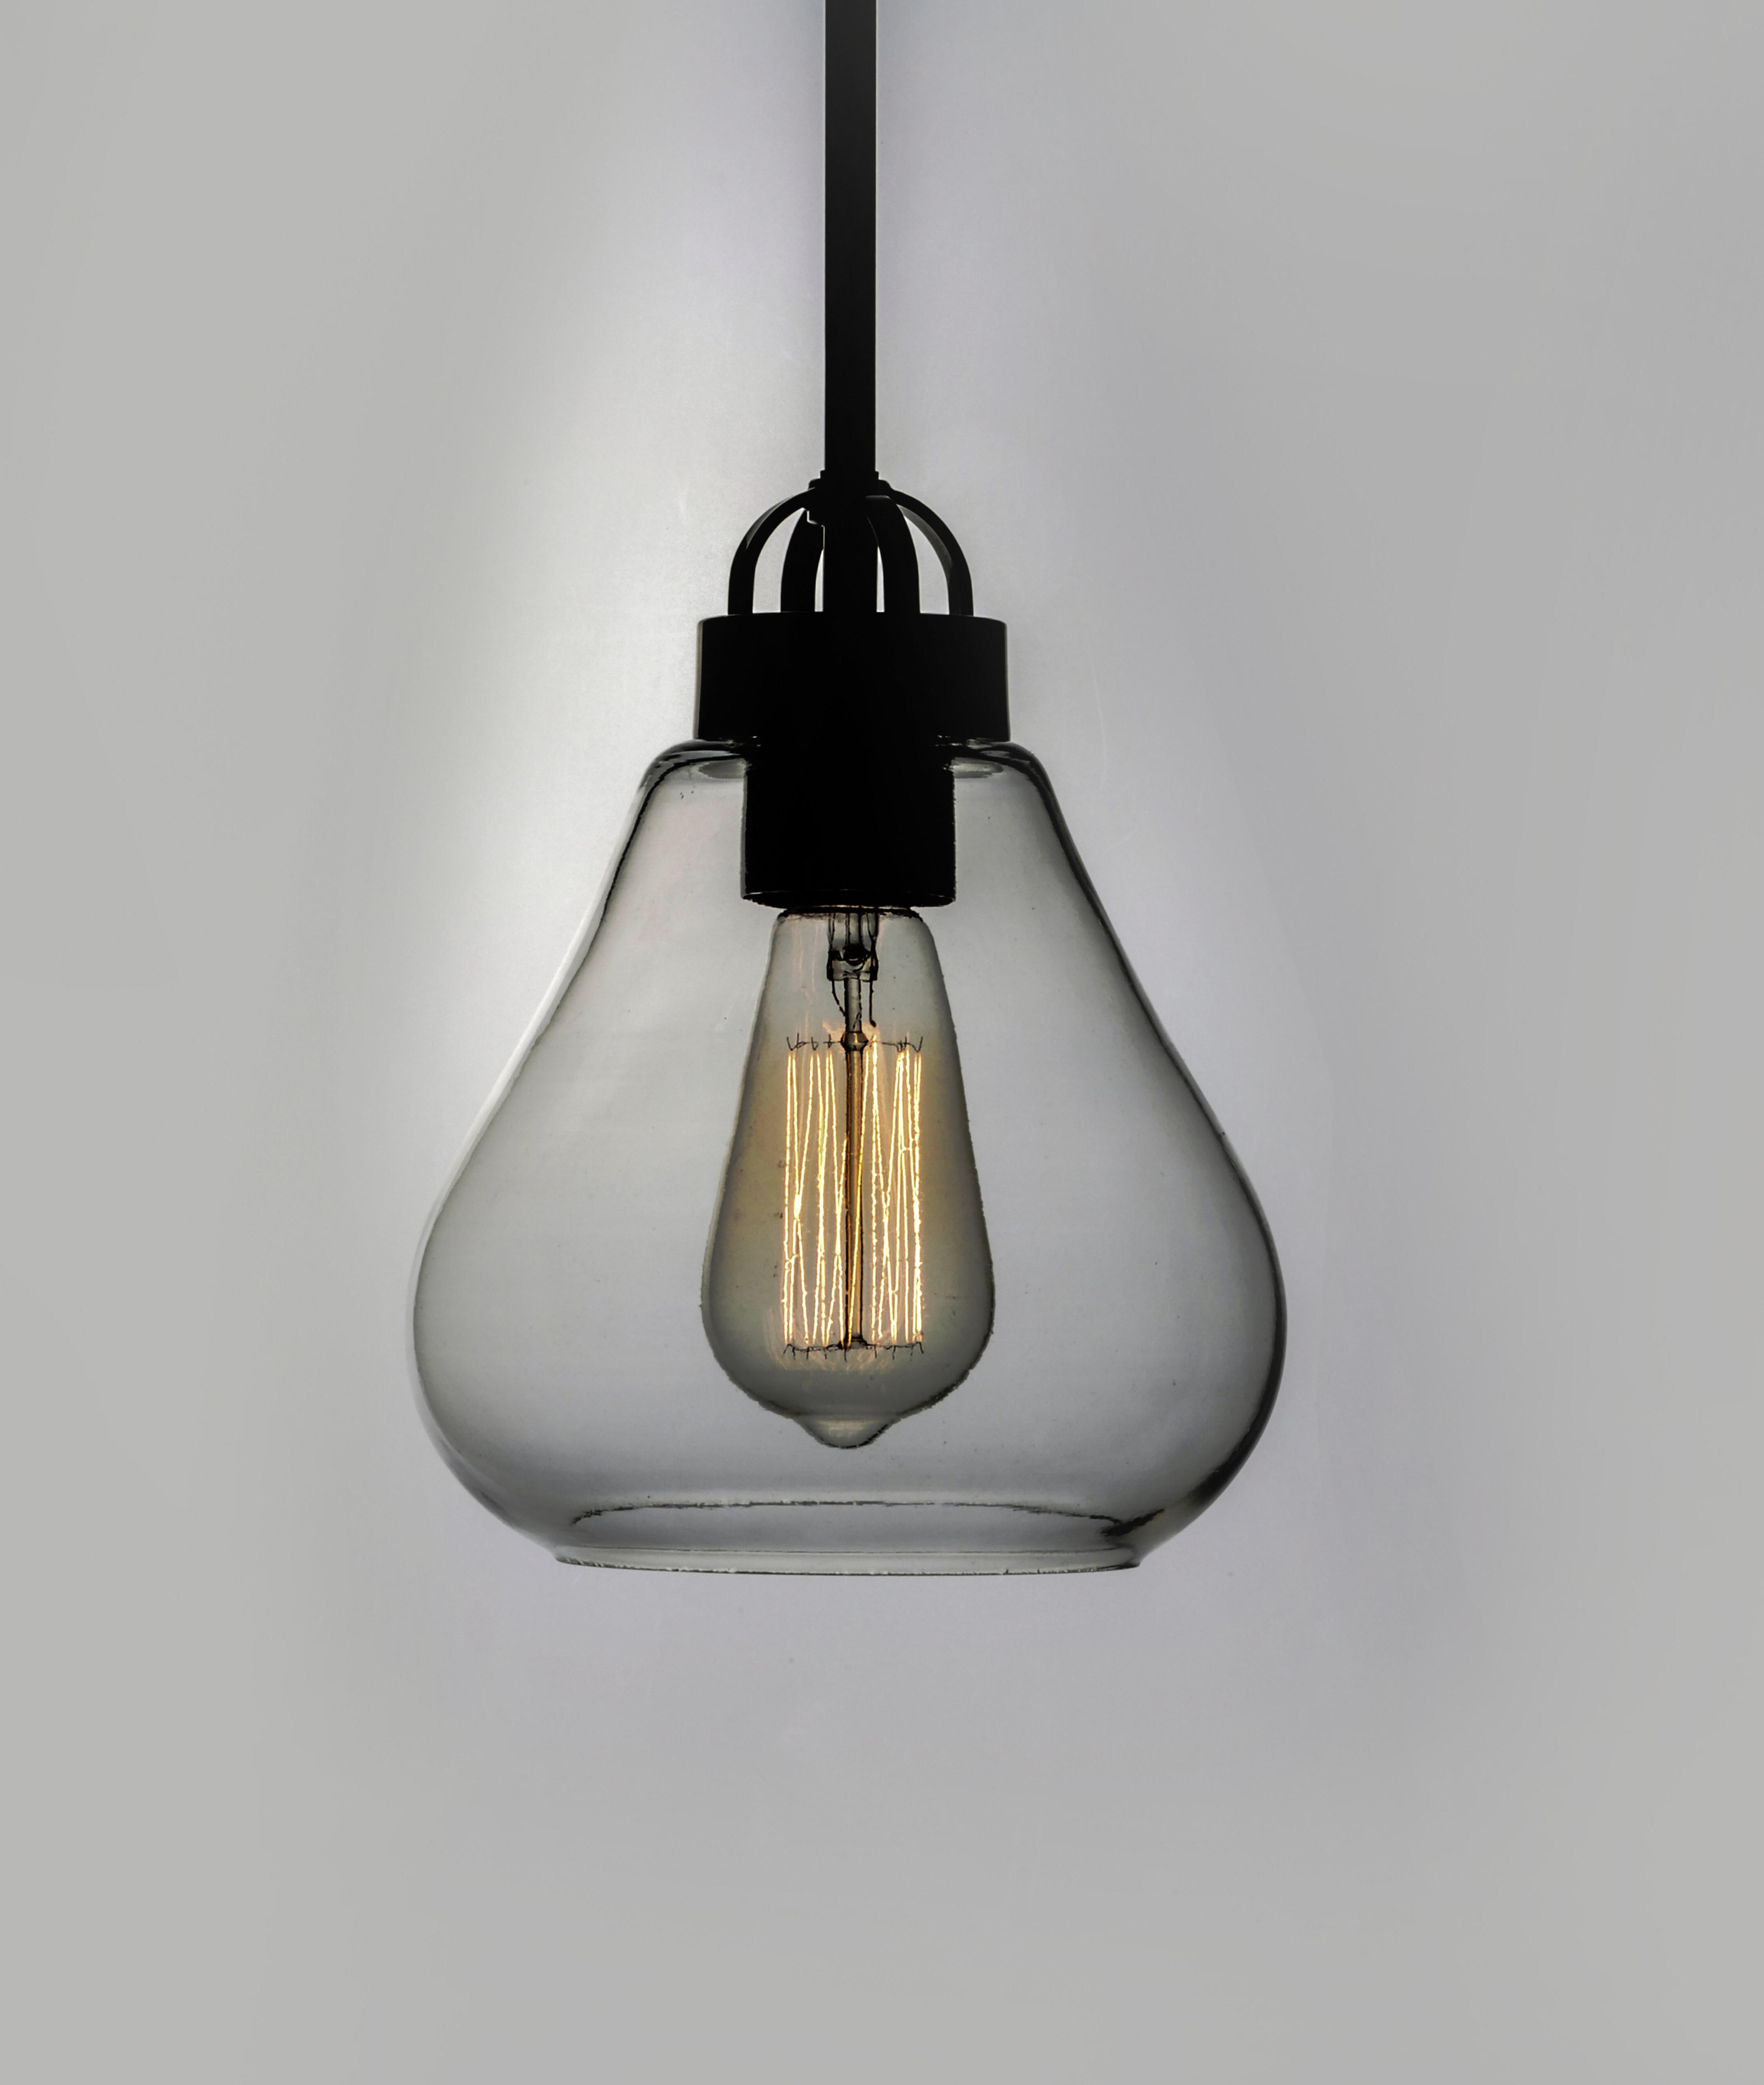 Pewter & Silver & Satin Nickel Pendant Lighting You'll Love Regarding Fashionable Kimsey 1 Light Teardrop Pendants (View 17 of 20)